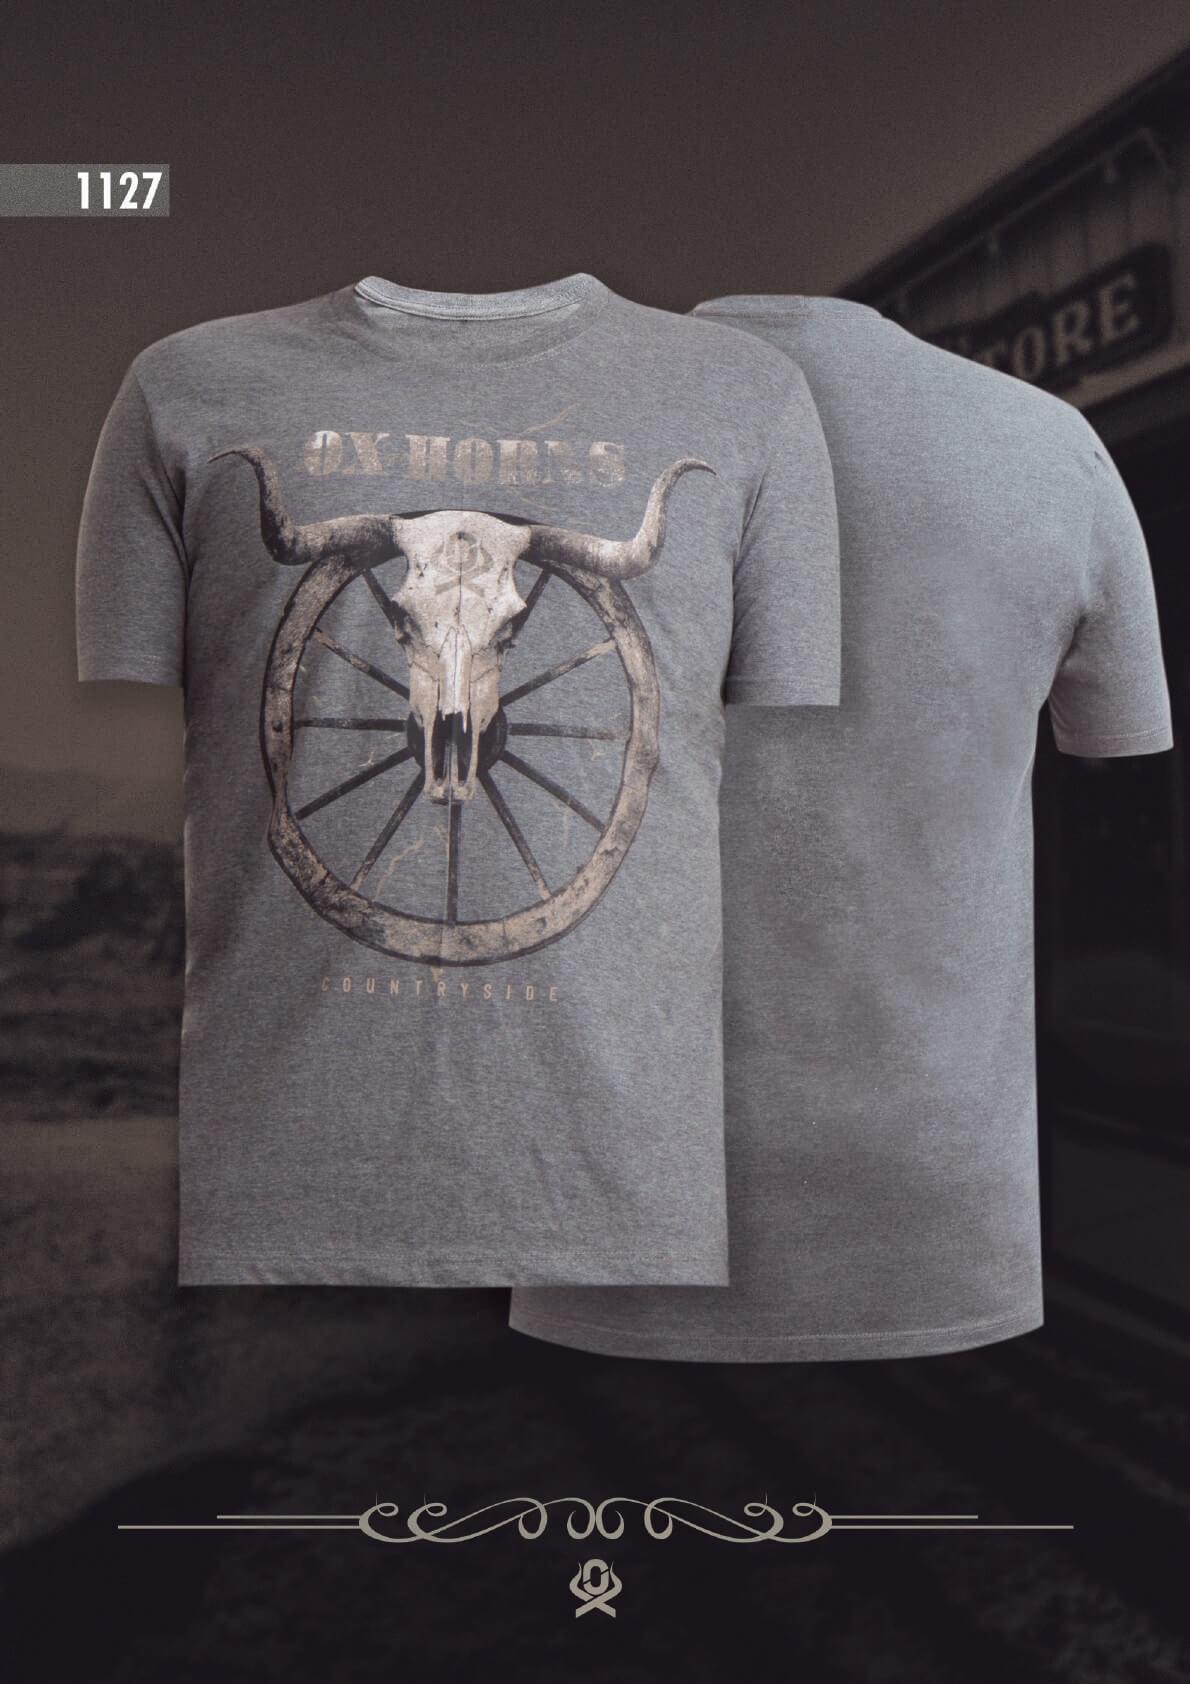 be2acacf13e69 Camiseta Ox Horns Masculina Cinza Mescla 1127 - Vitrine do Cowboy ...